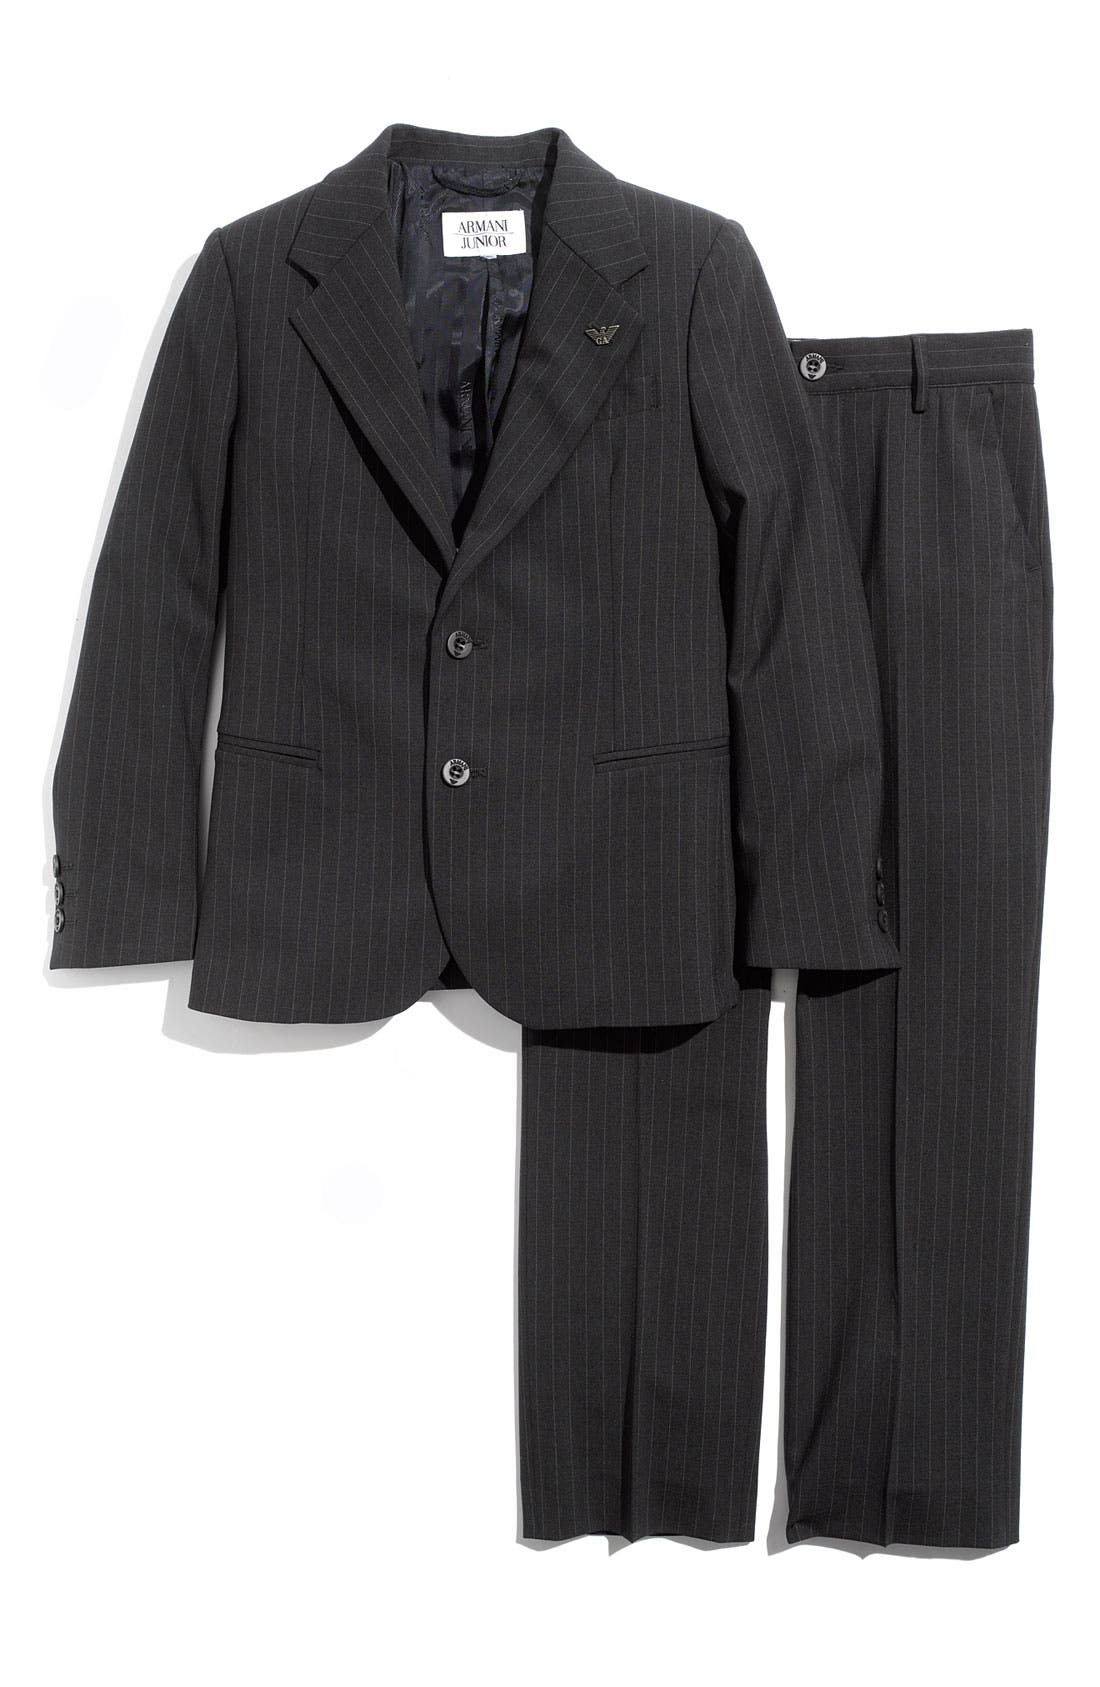 Main Image - Armani Junior Two Piece Suit (Big Boys)